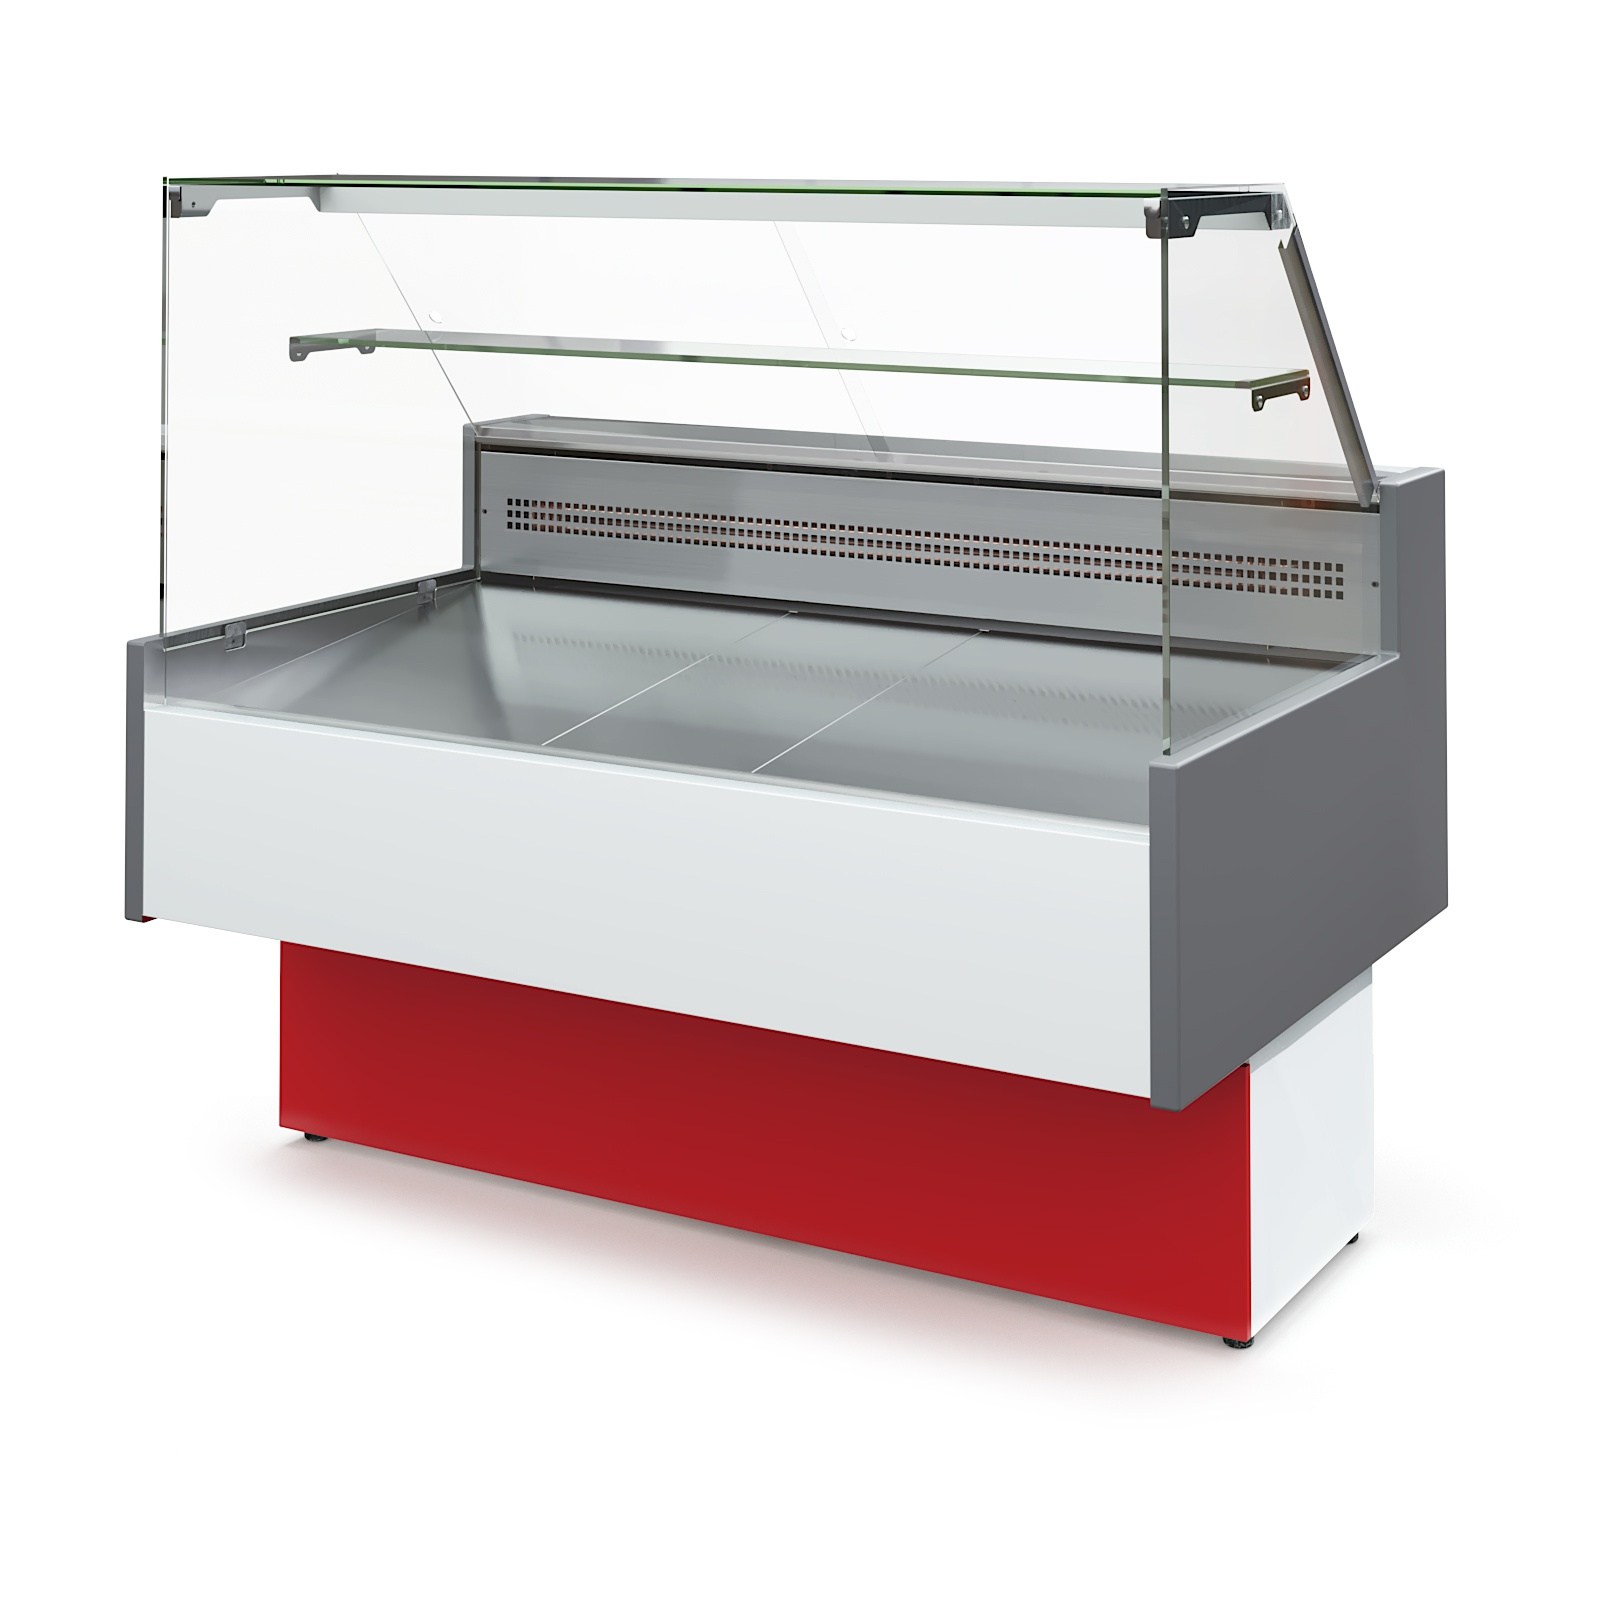 Холодильная витрина ТАИР Cube ВХСн-1,5